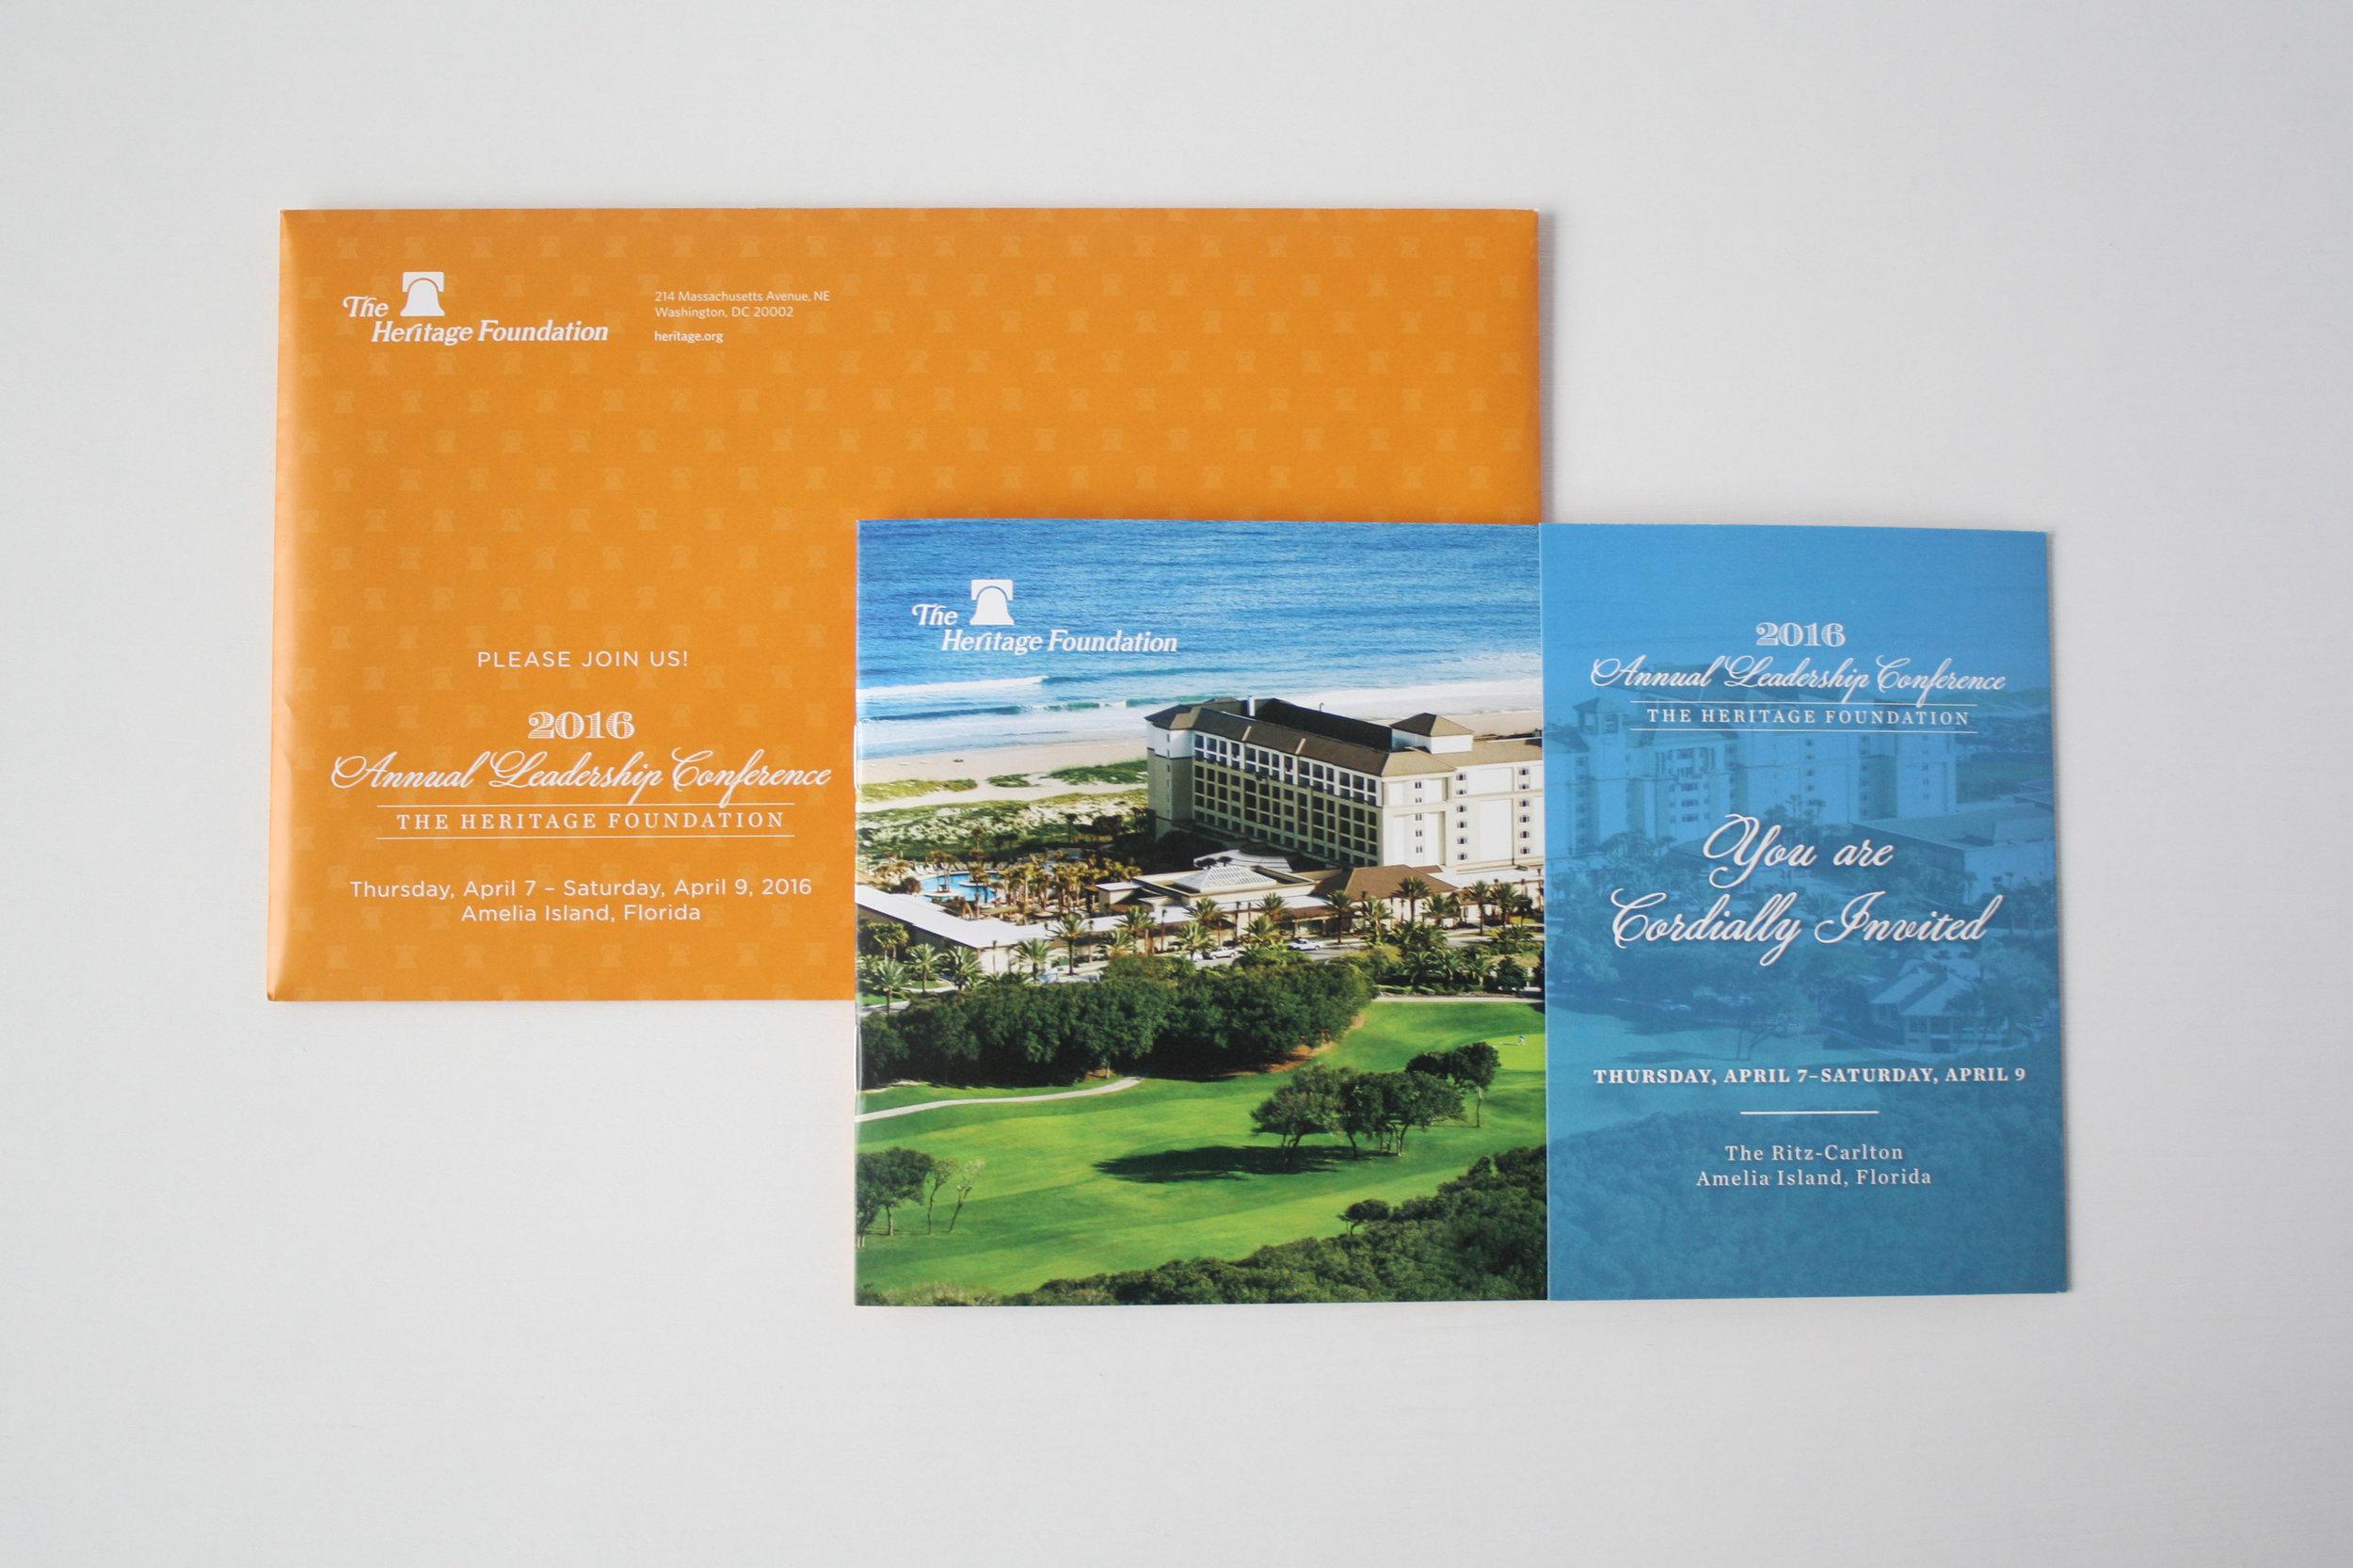 Annual Leadership Conference Invitation   Casi Long Design   casilong.com:portfolio   #casilongdesign #fearlesspursuit 6.jpg